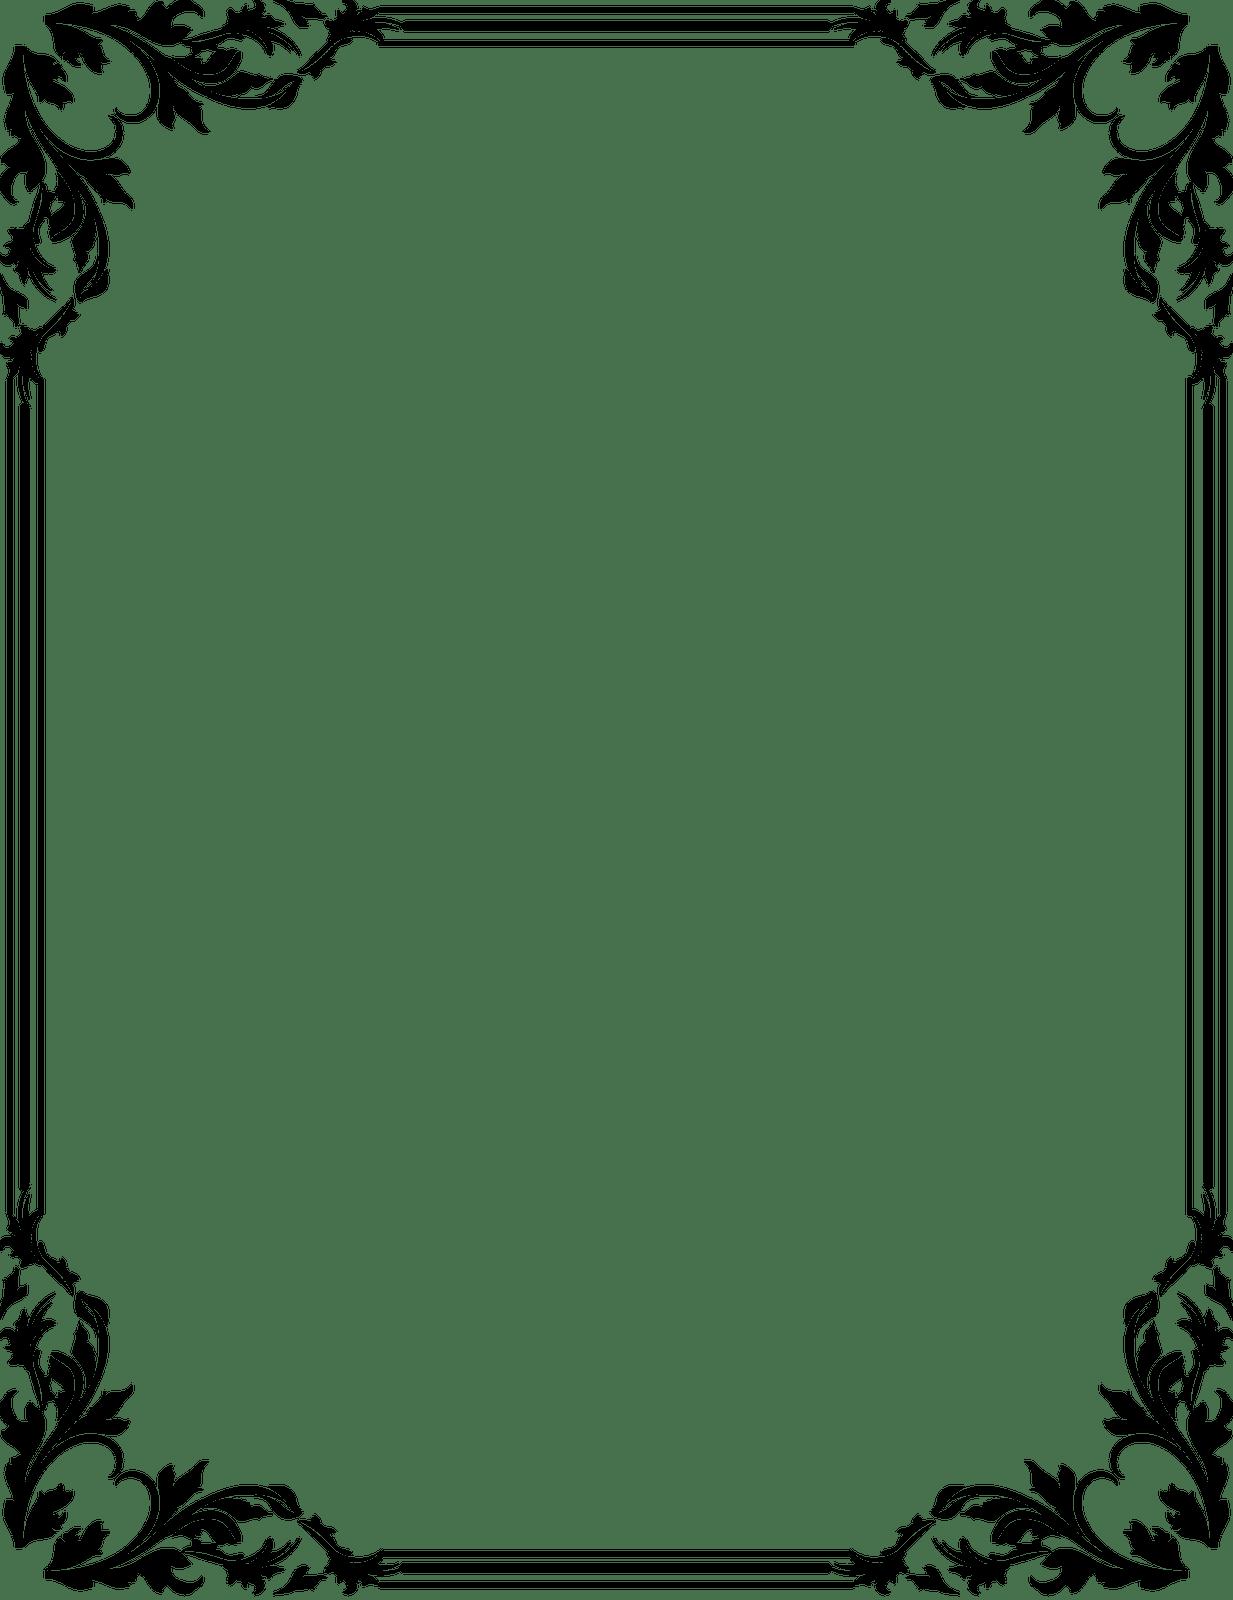 Restaurants Clipart Free Download On Webstockreview